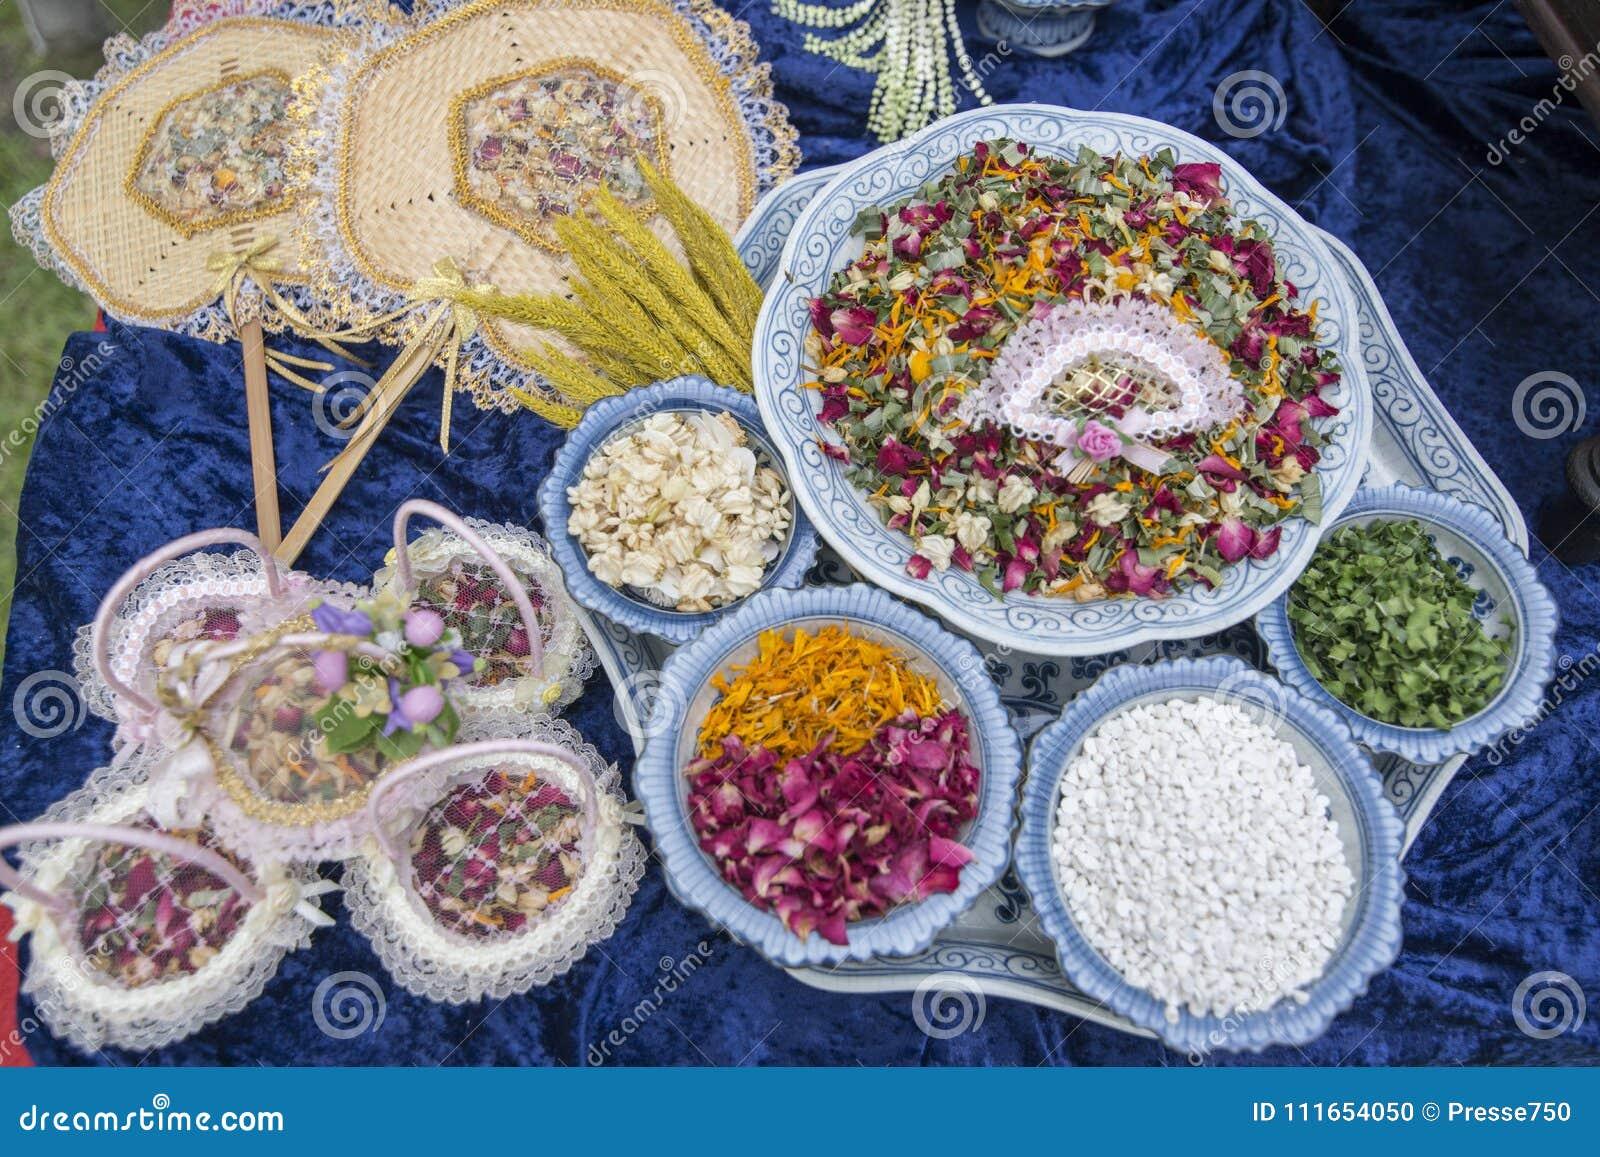 Asian markets riverside congratulate, this